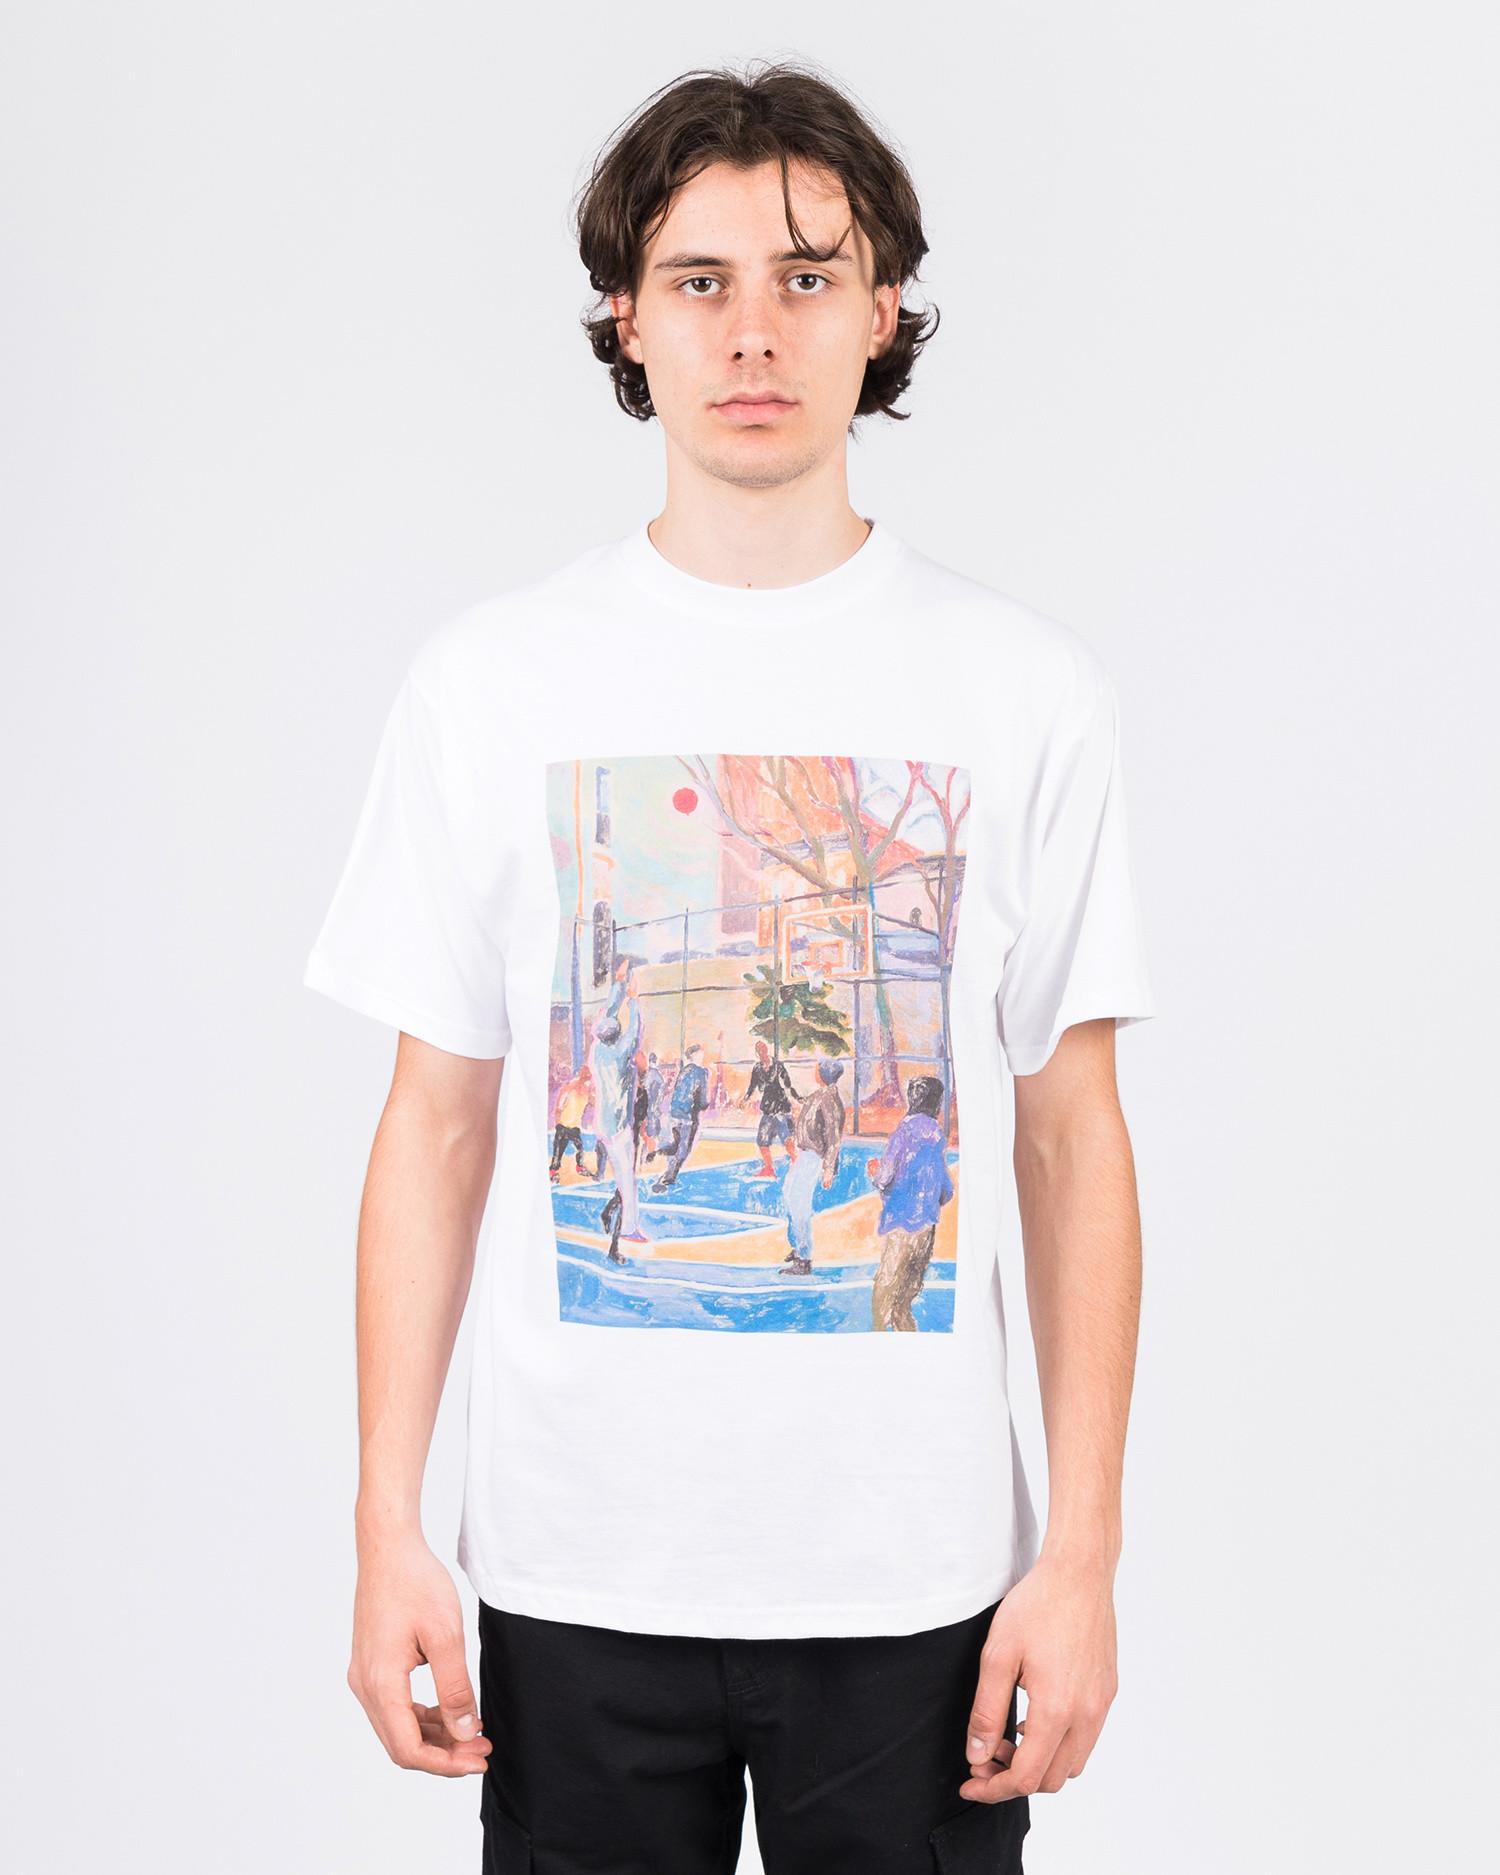 Free Skate Mag Brian Lotti Artwork T-Shirt White